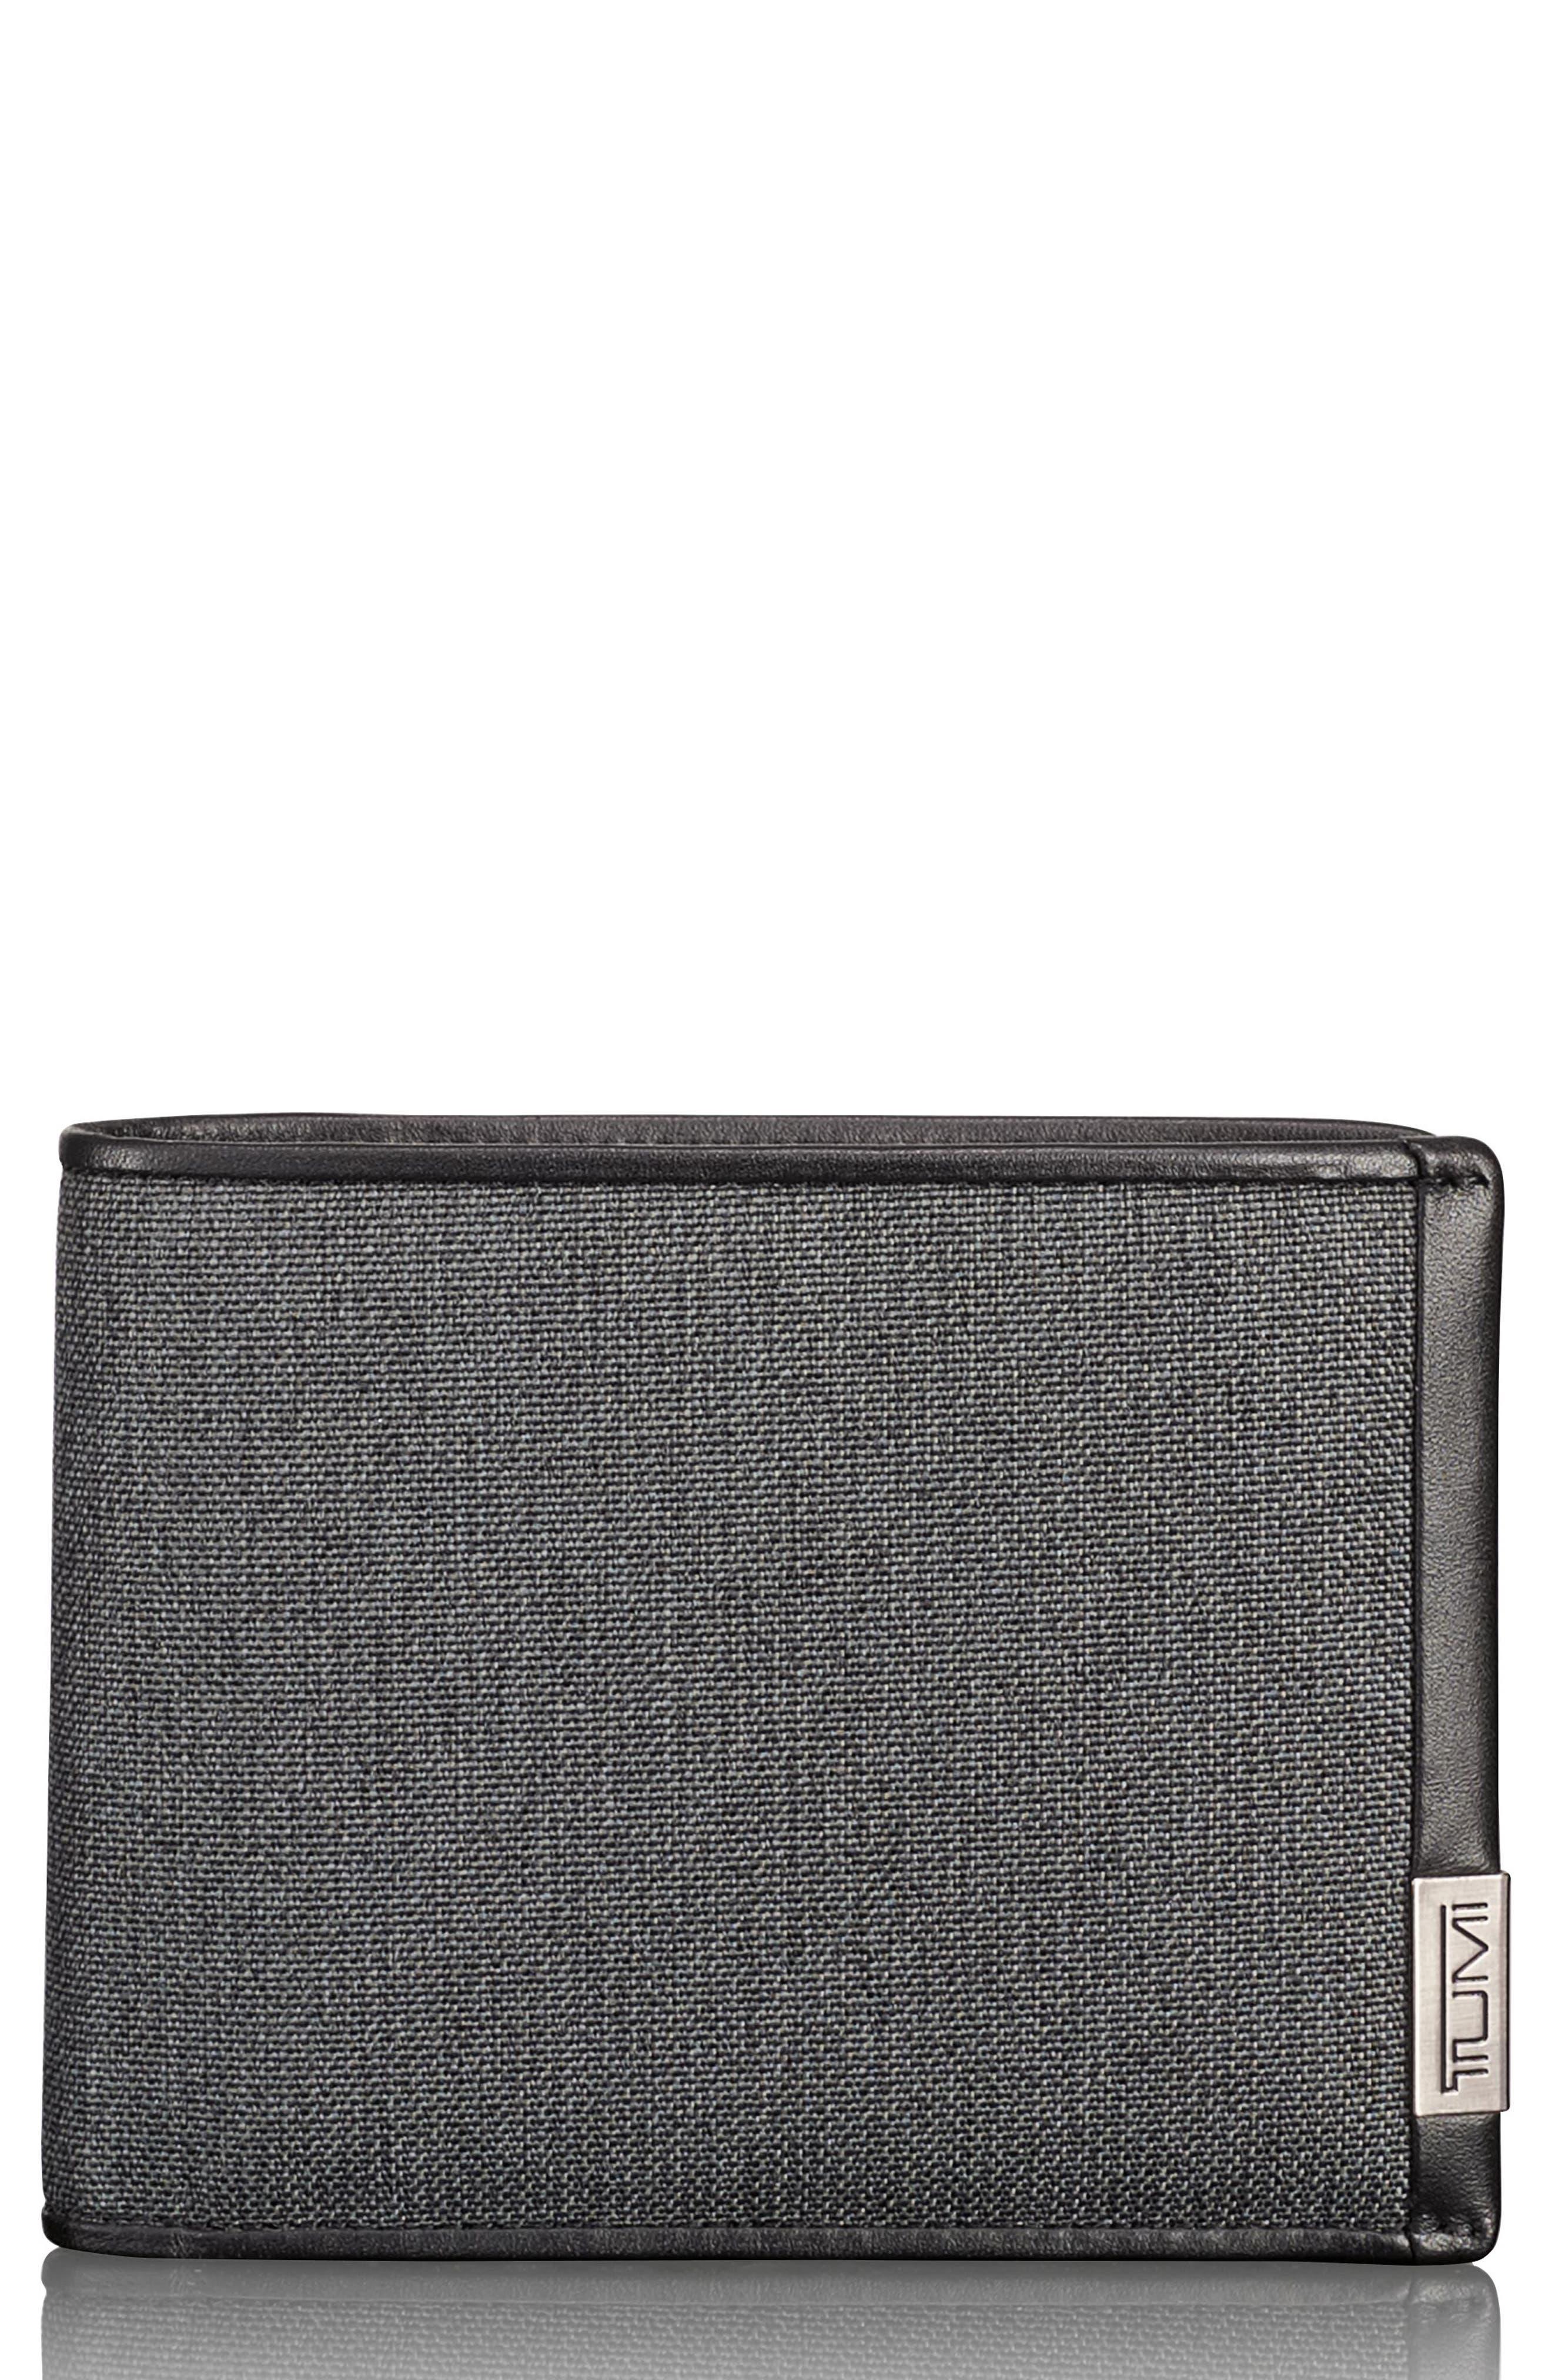 Alpha Global Pass Case Wallet,                         Main,                         color, Anthracite/ Black